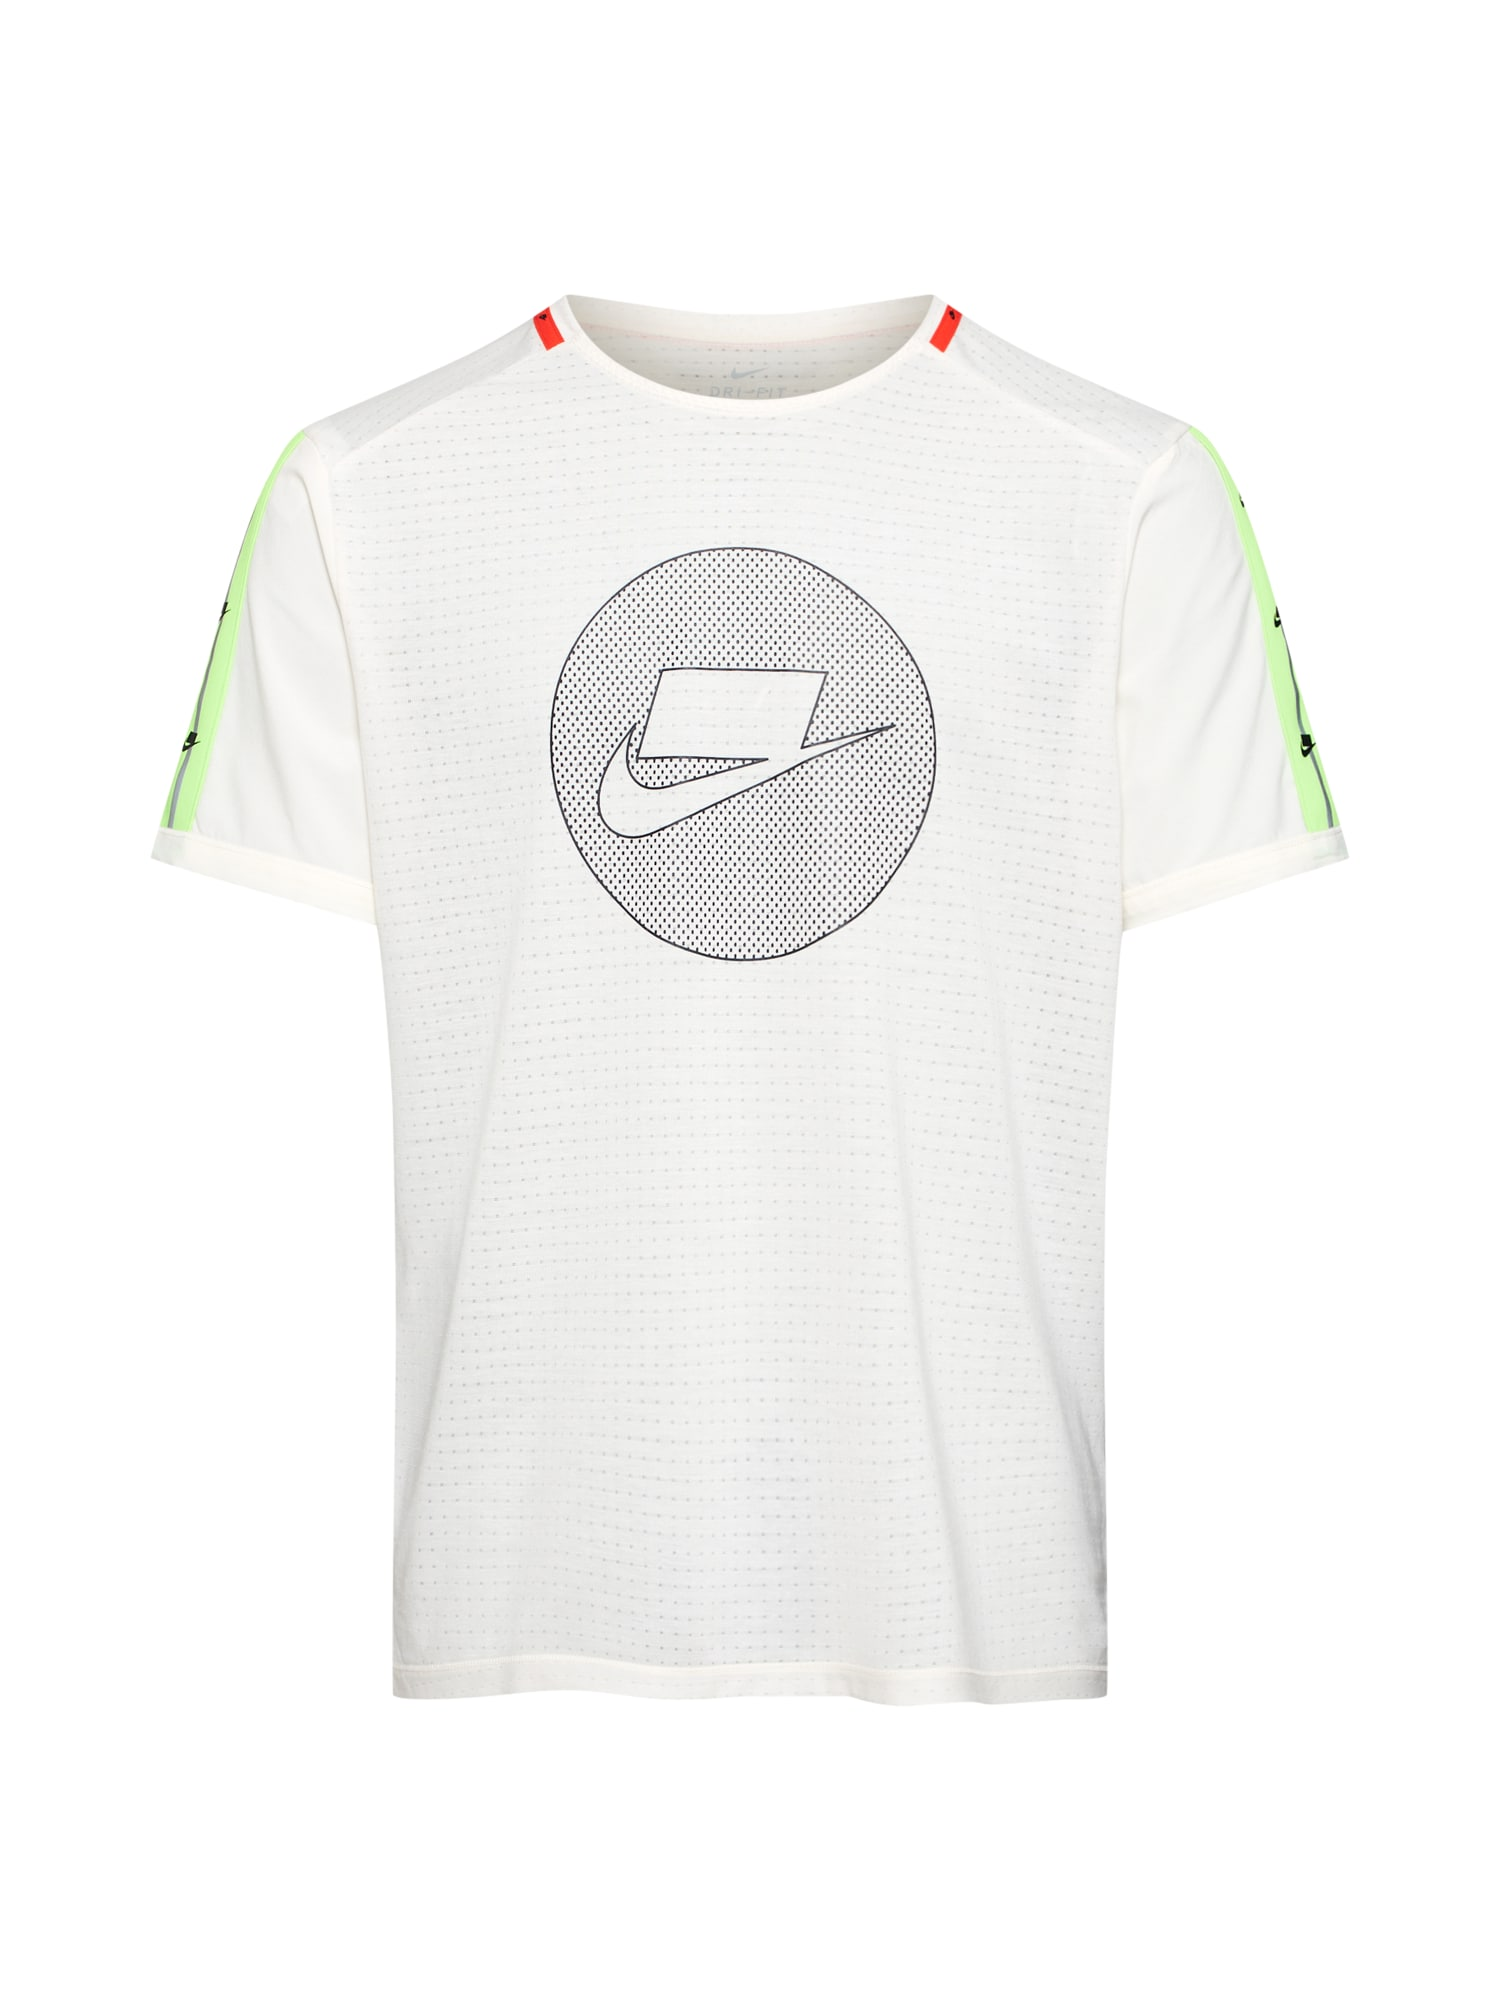 Sport-Shirt 'WILD RUN TOP SS' | Sportbekleidung > Sportshirts | Nike